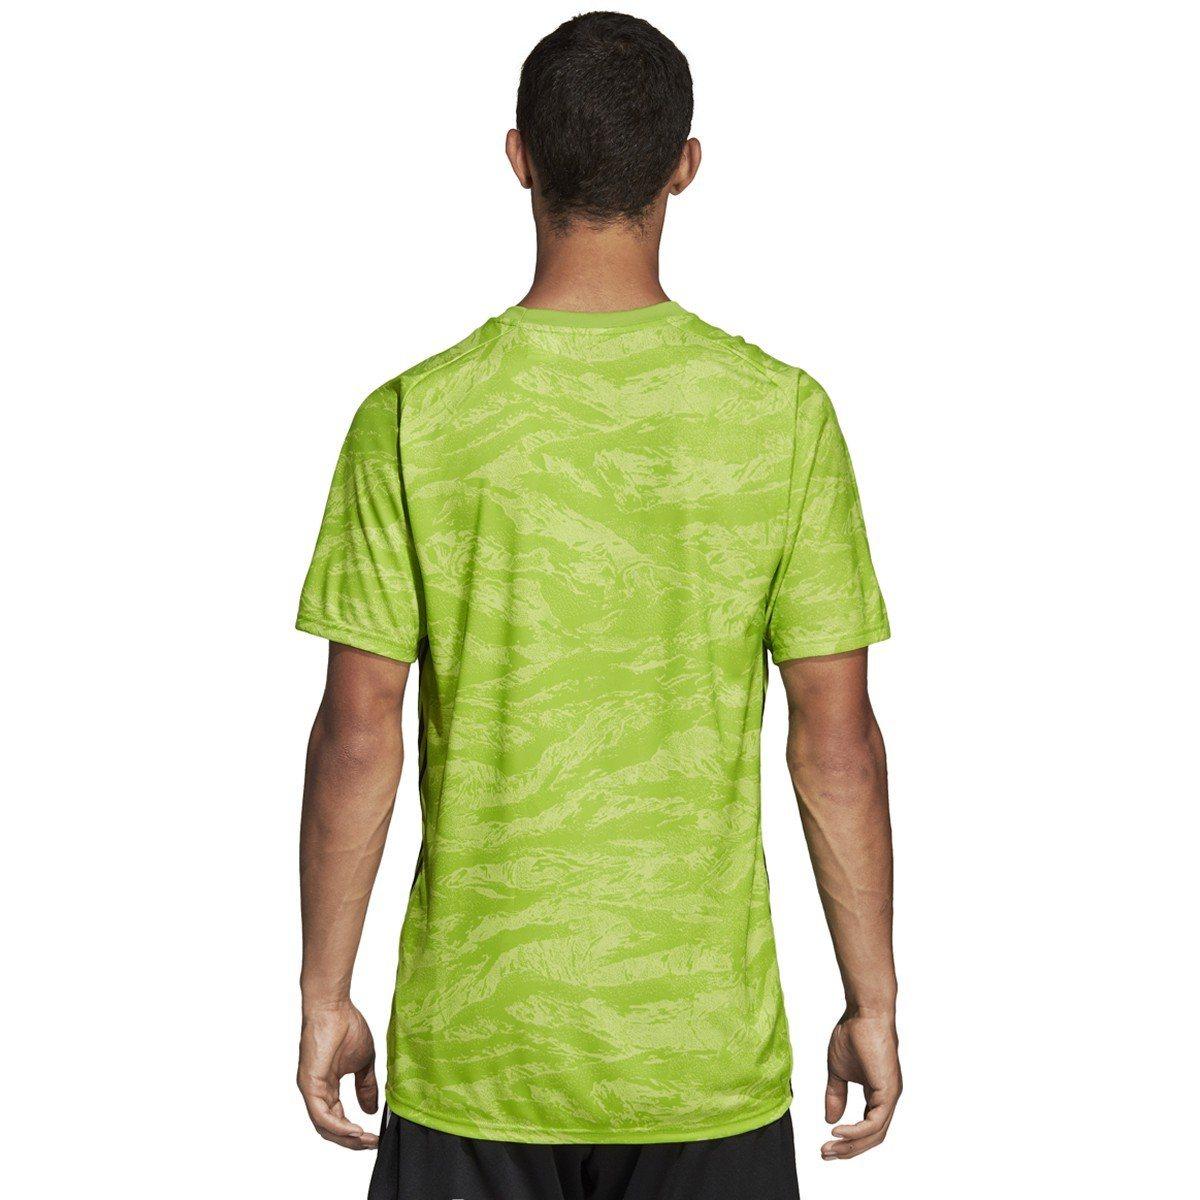 adidas Men's AdiPro 19 Goalkeeper Shortsleeve Jersey   DP3131